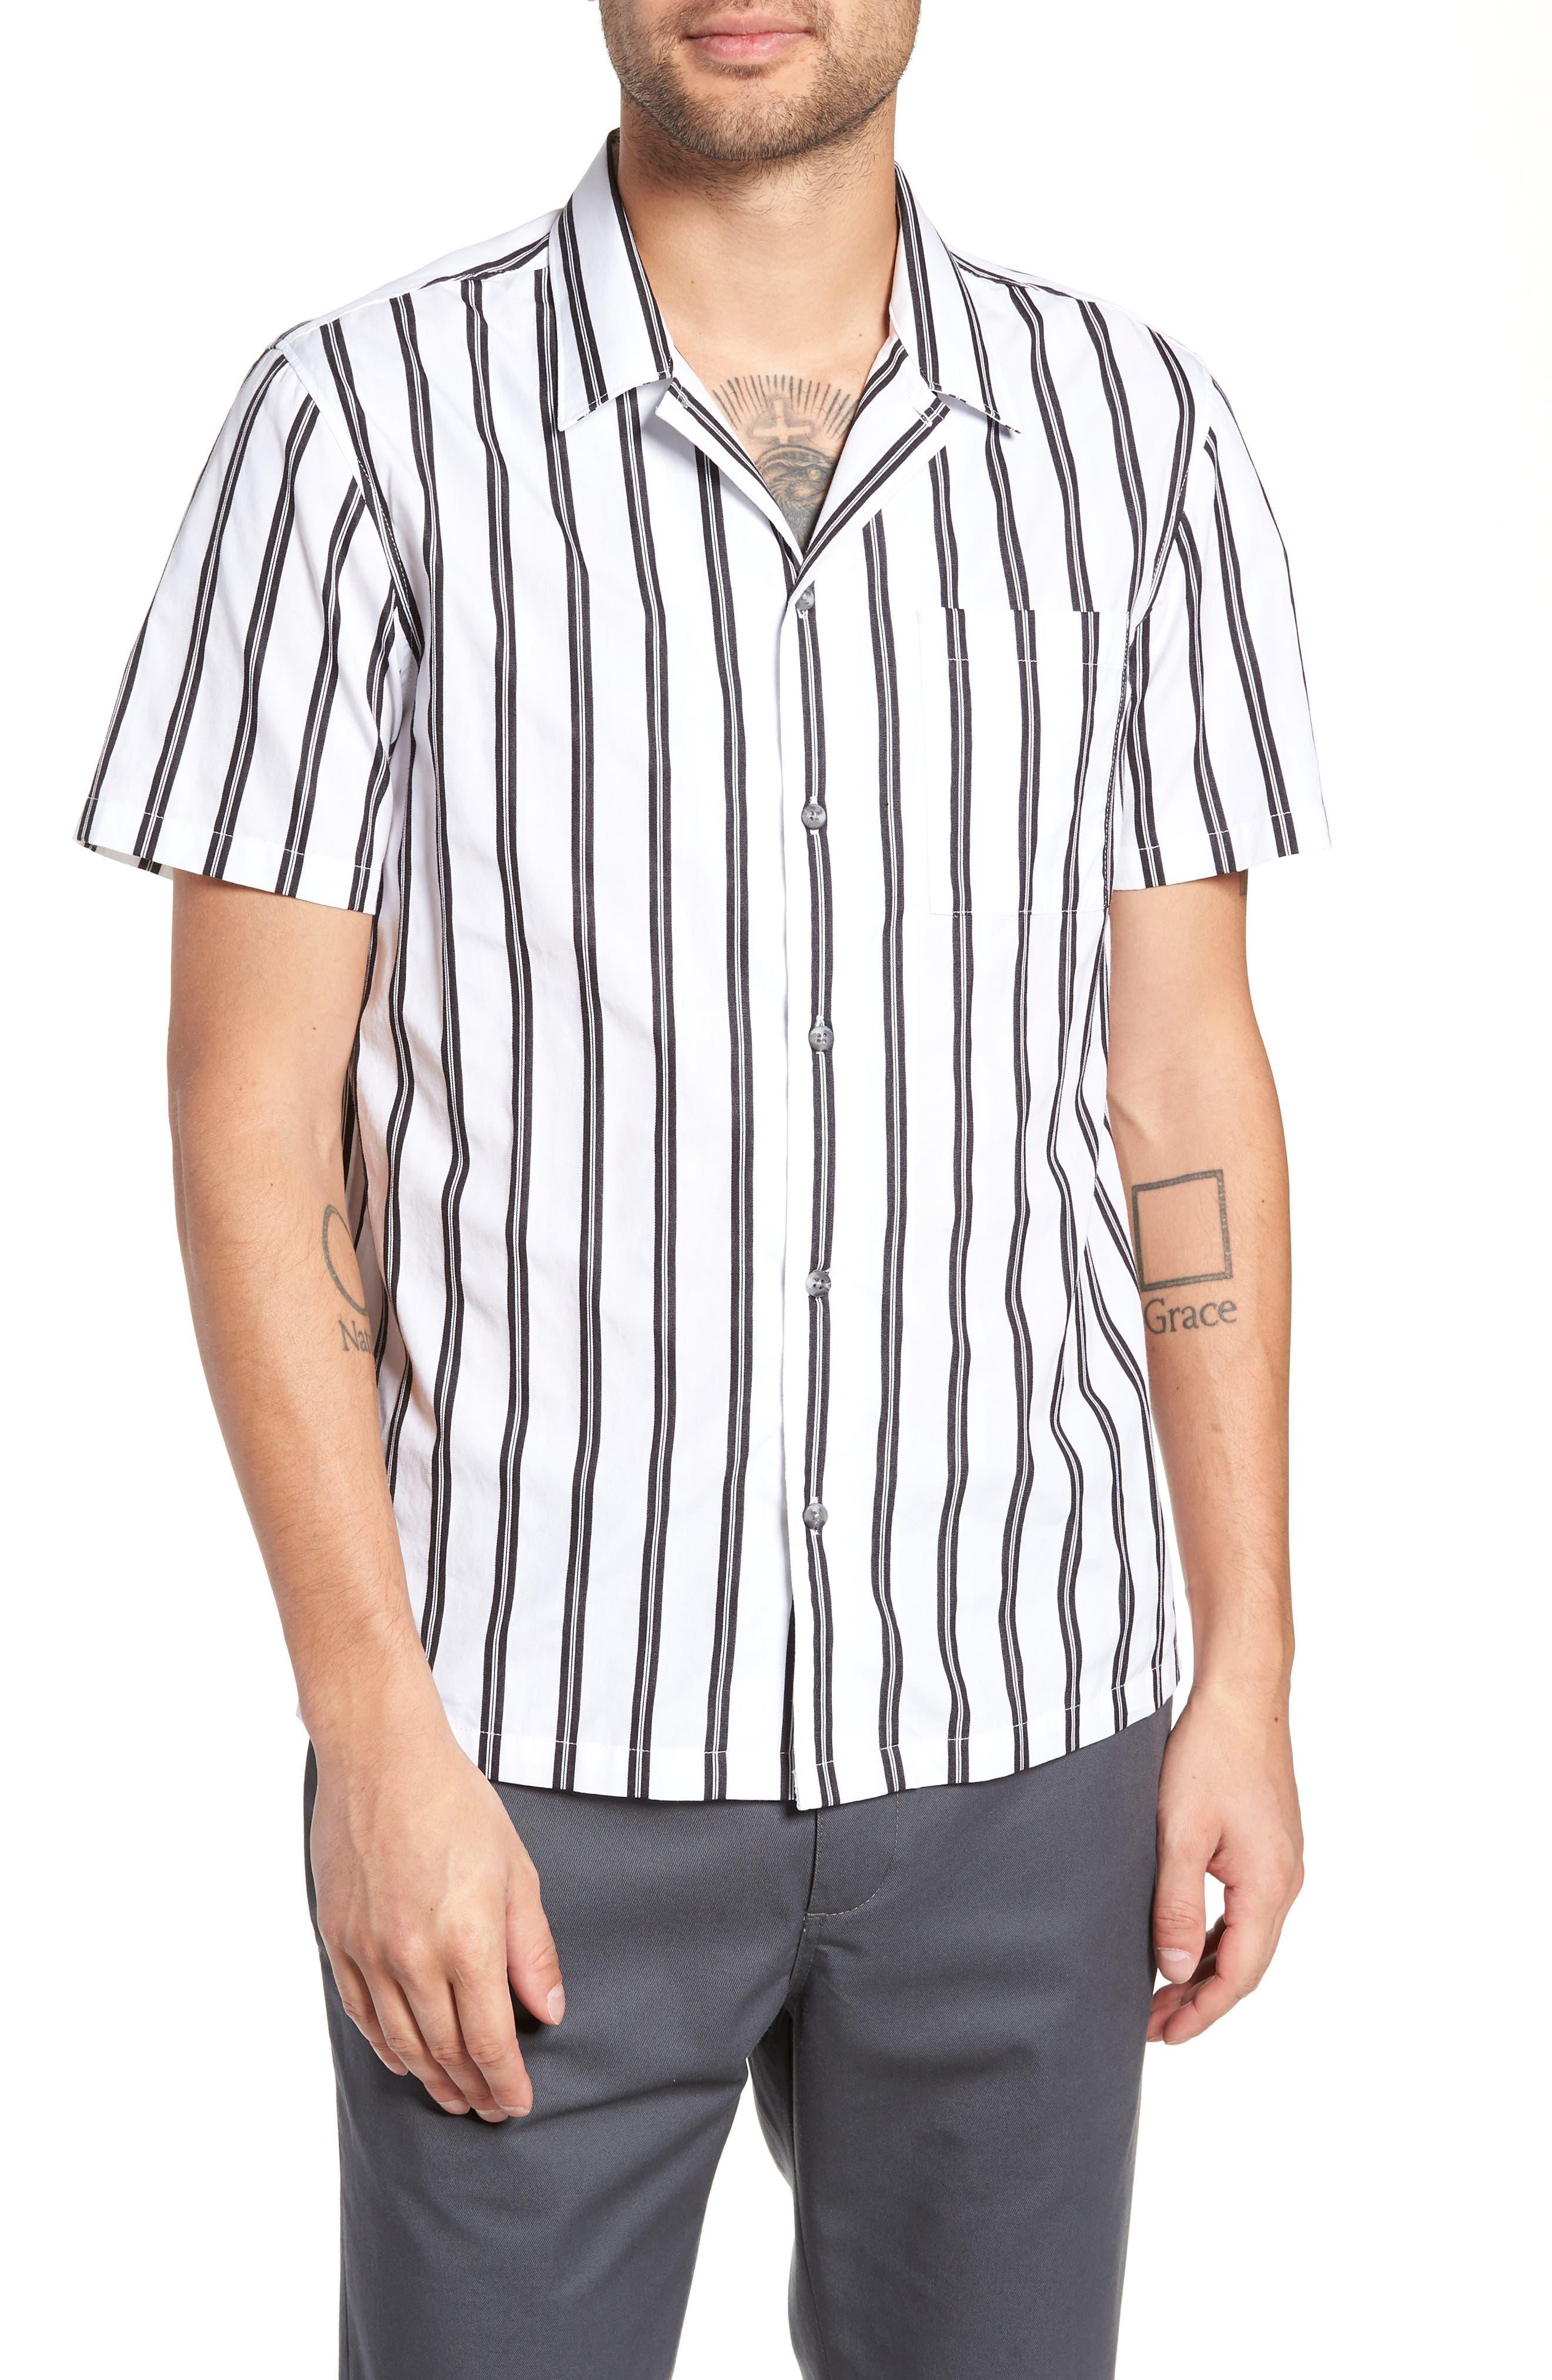 TAVIK Gable Dobby Stripe Camp Shirt in Black Stripe